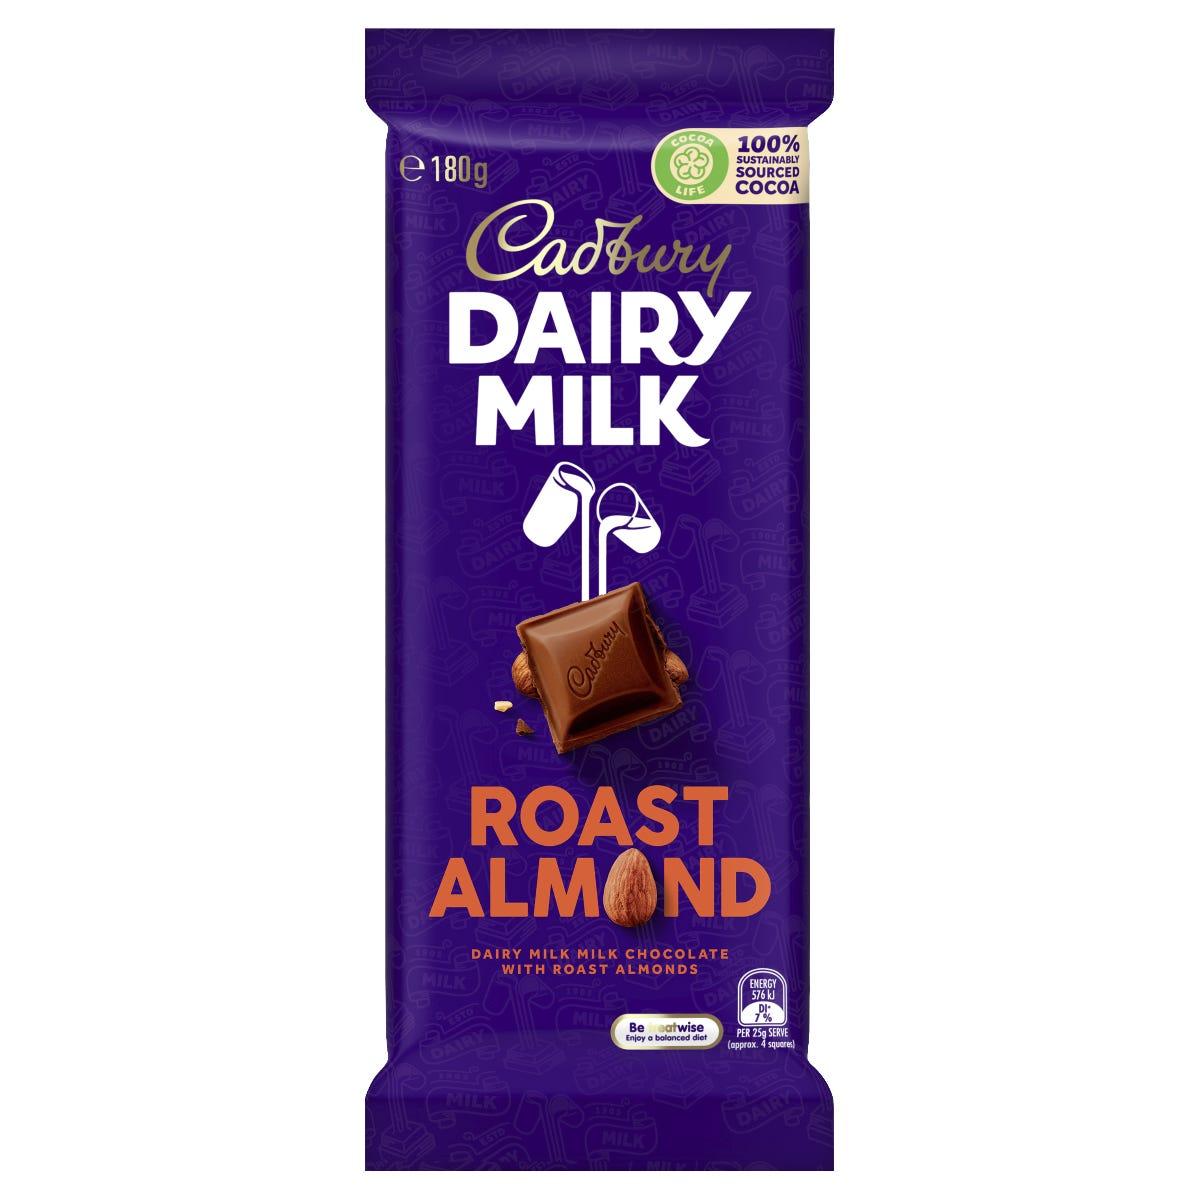 Cadbury Dairy Milk Roast Almond milk chocolate block 180g